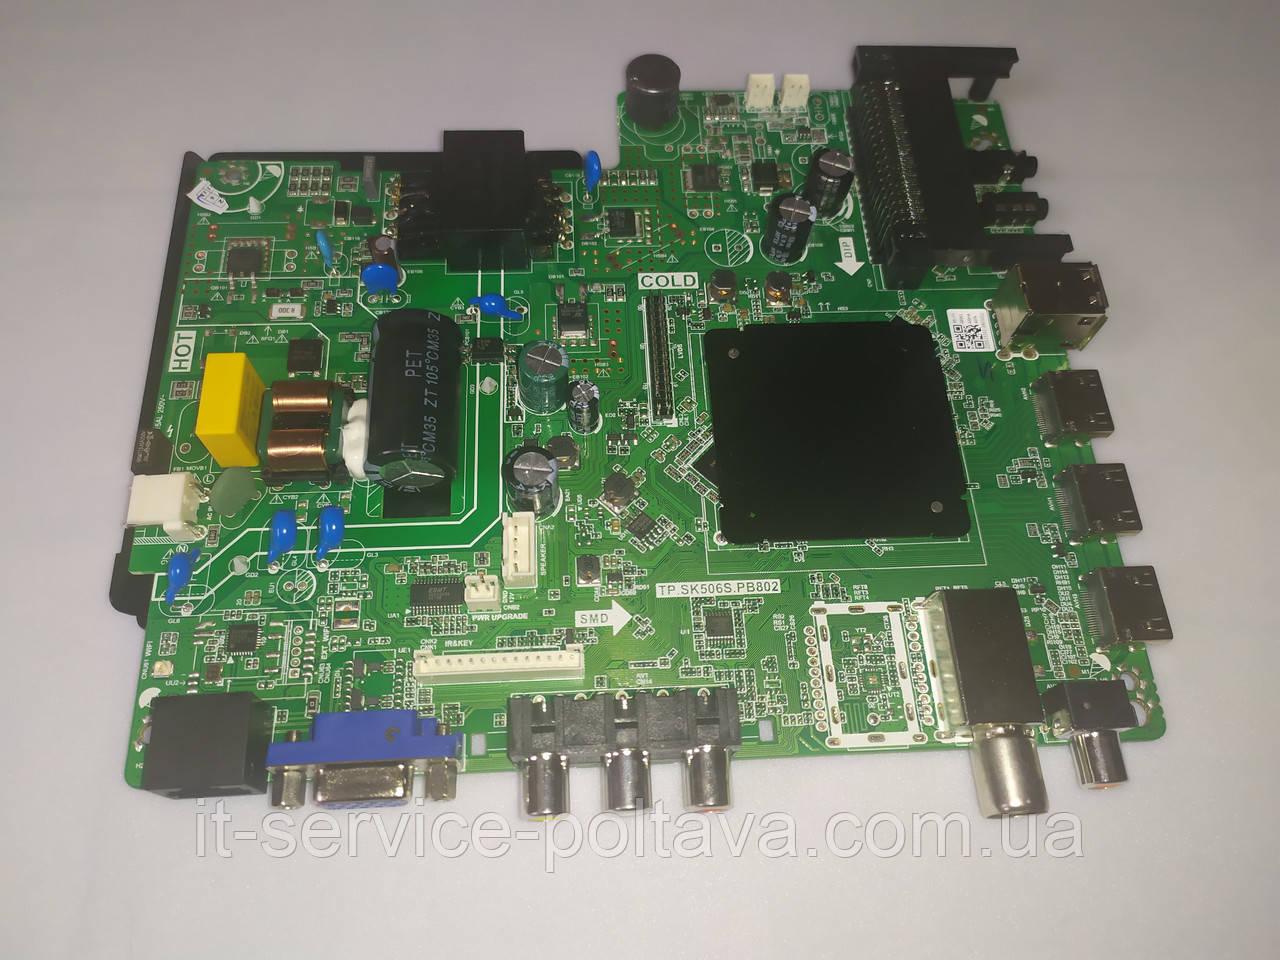 Материнська плата (Main Board) TP.SK506S.PB802